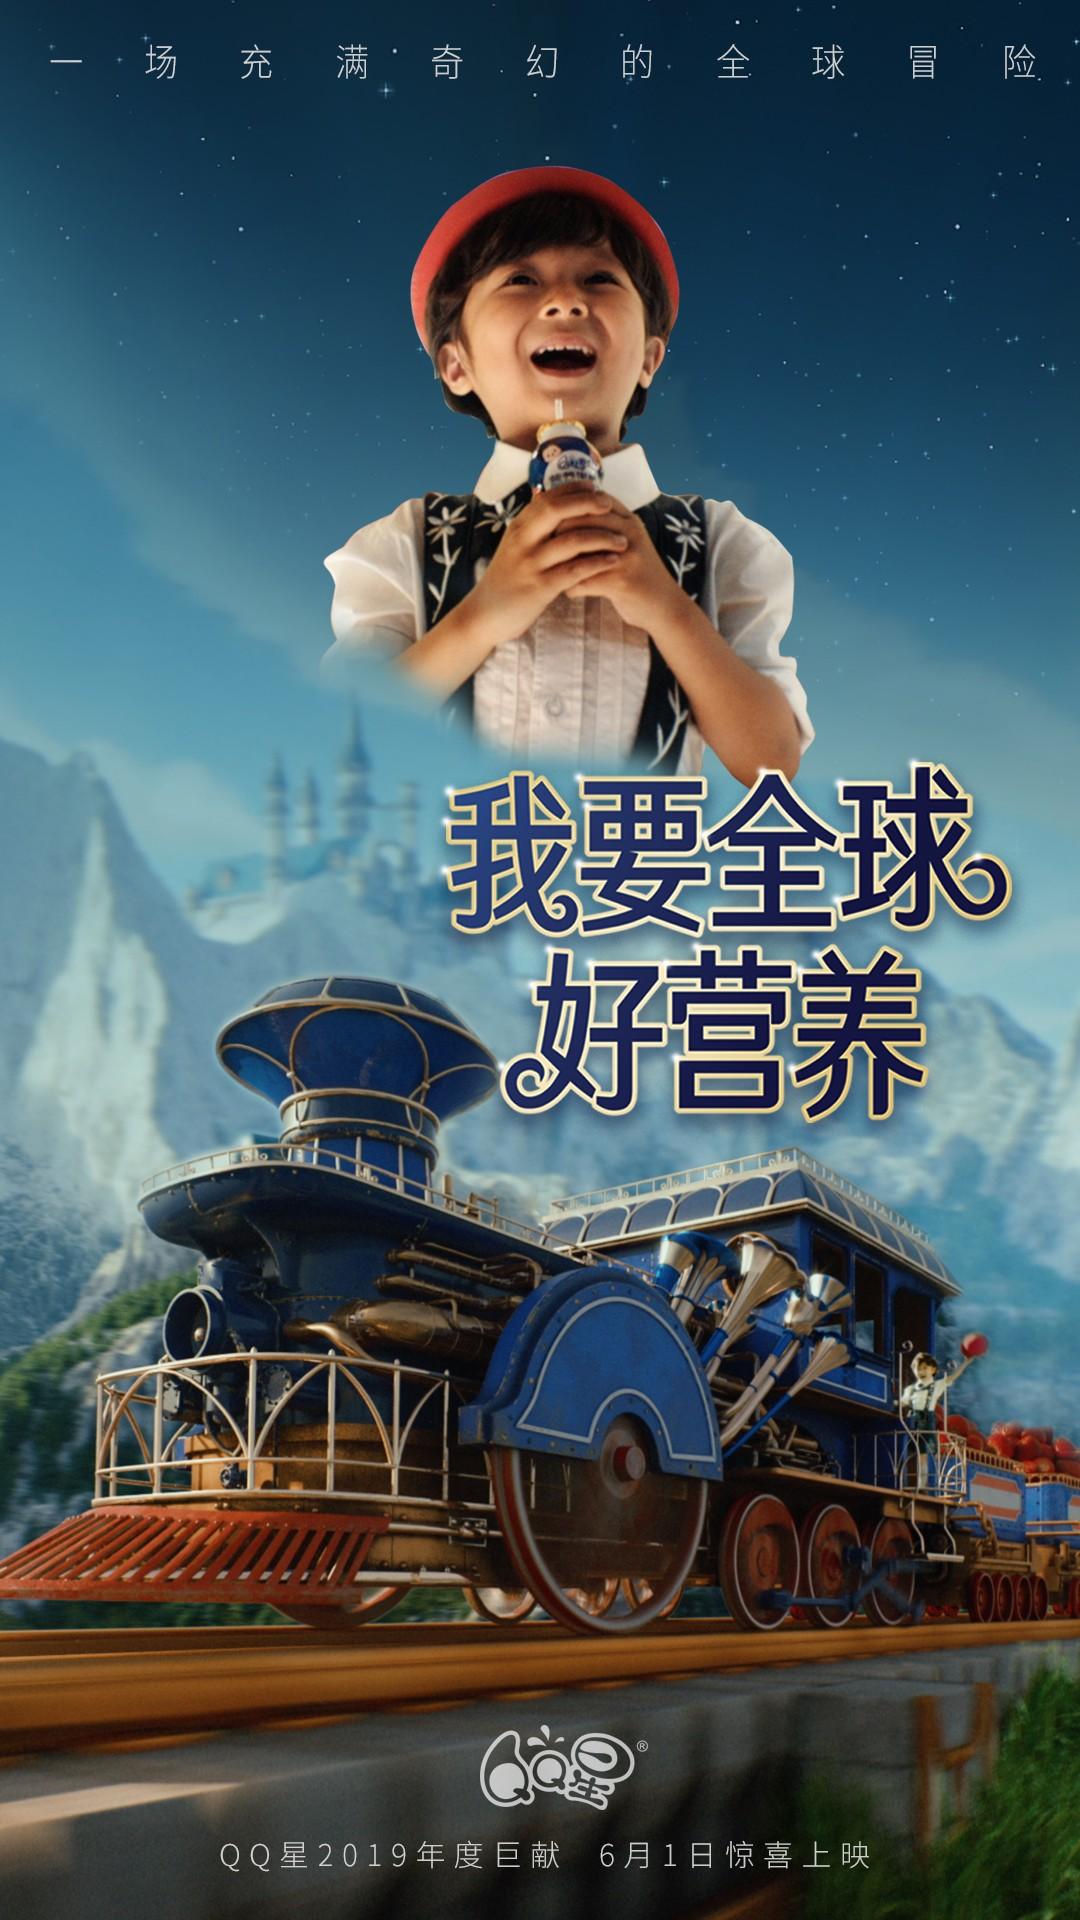 QQ星上映海报.jpg